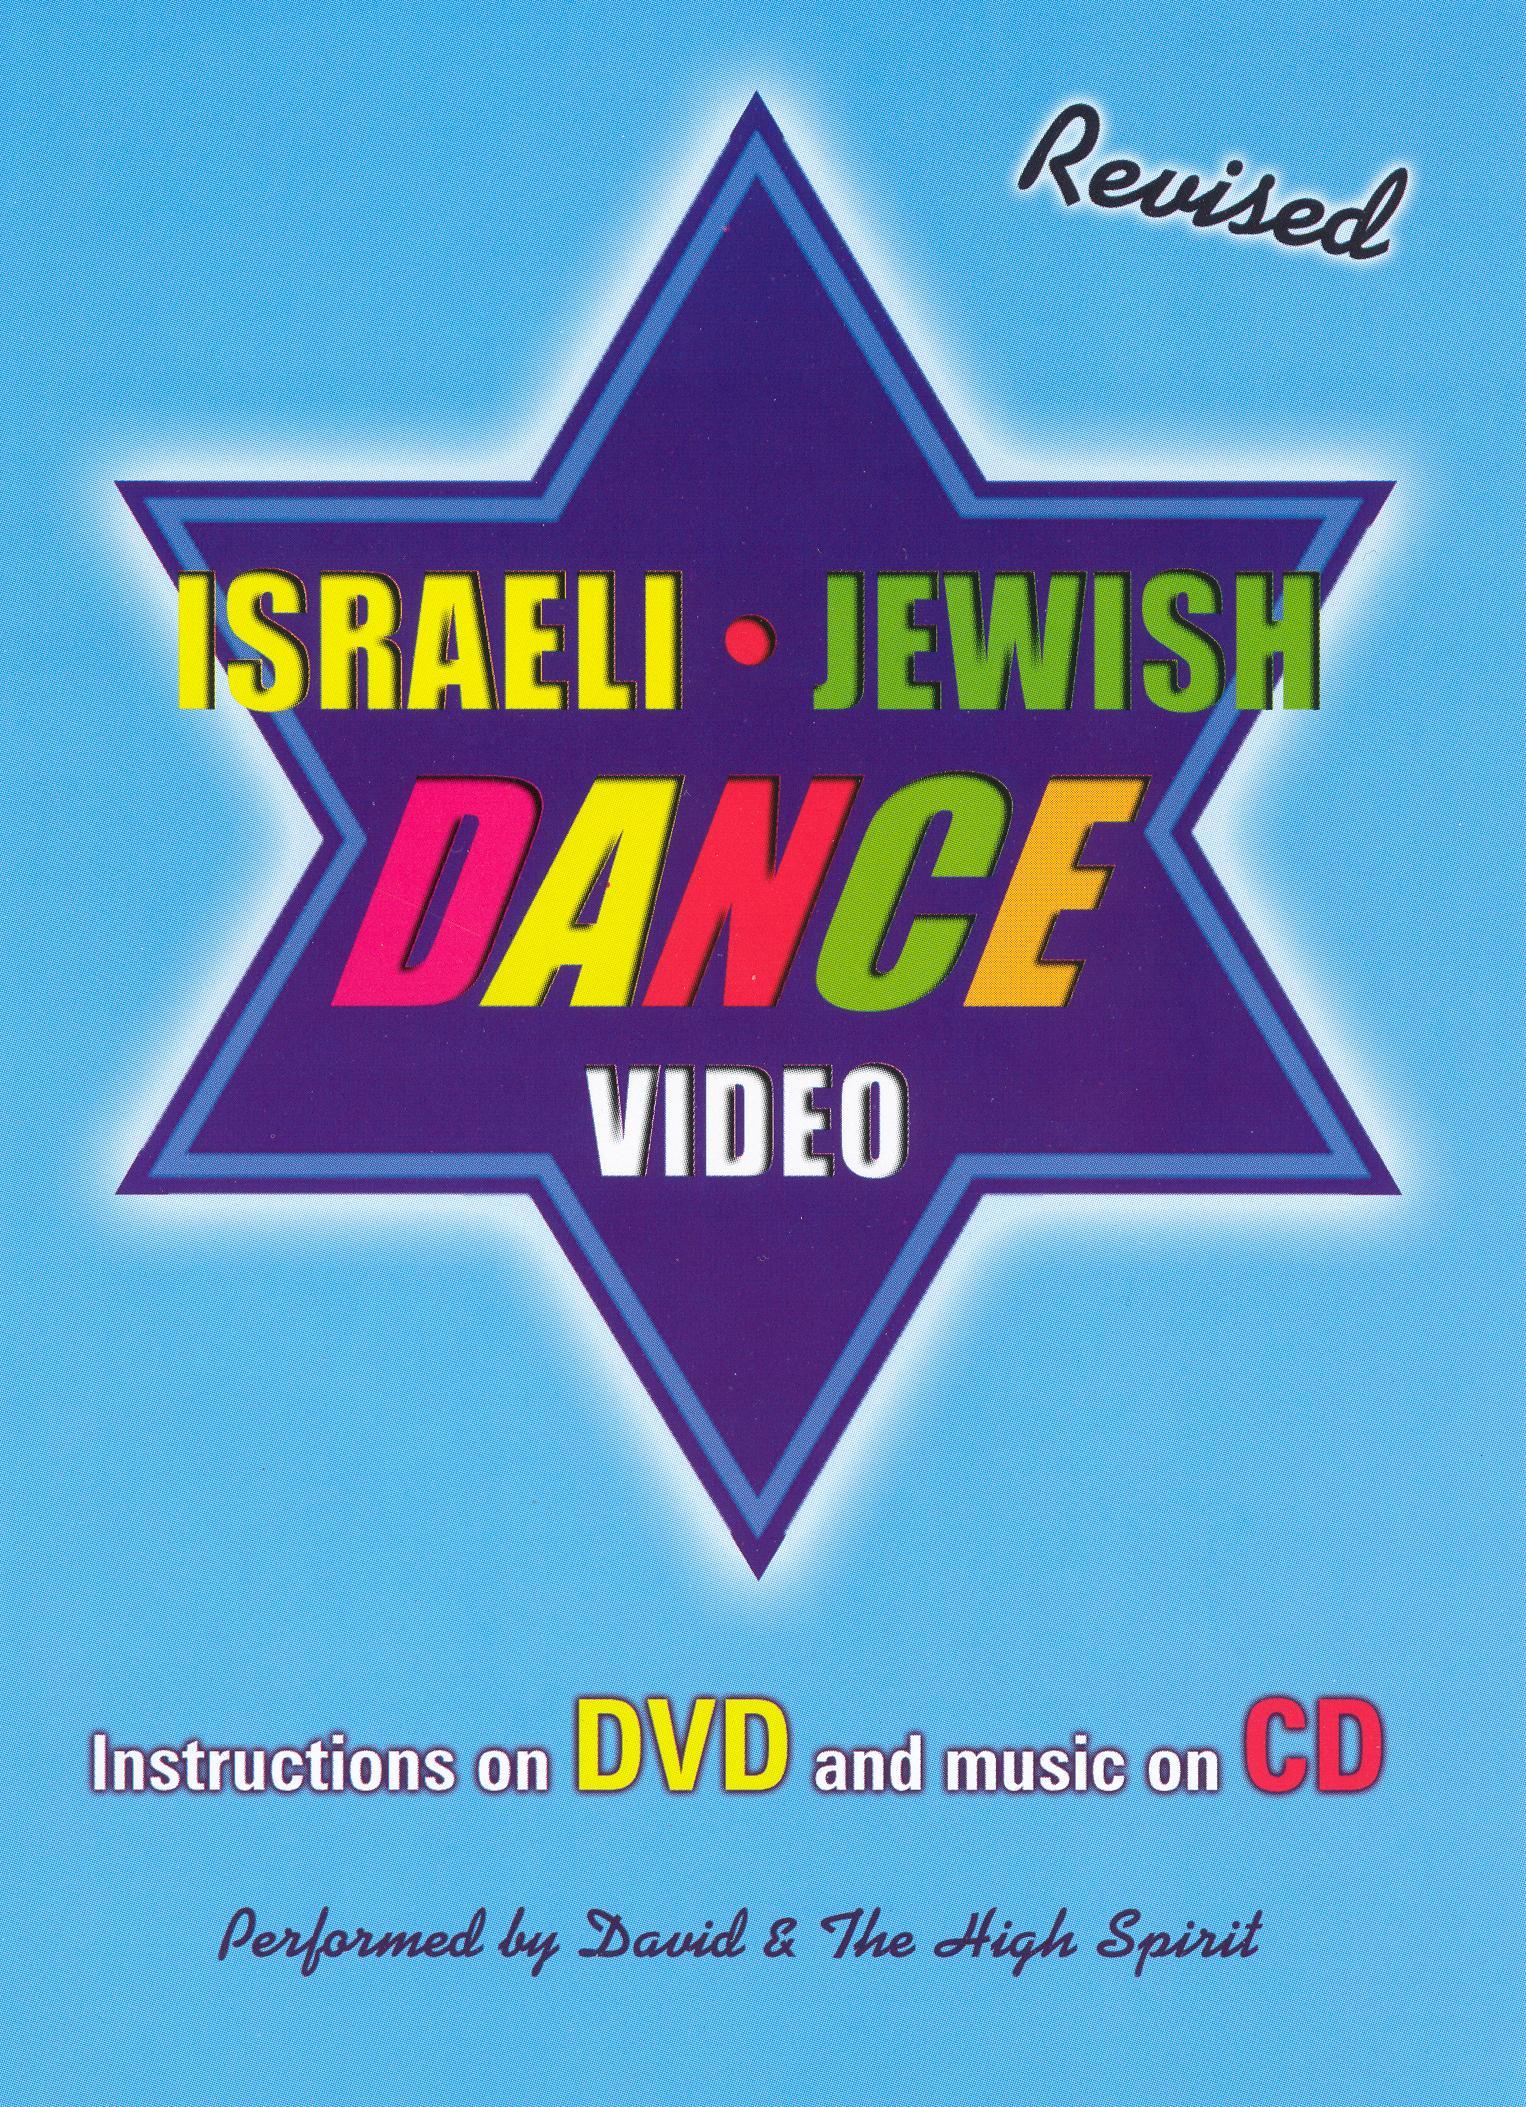 Israeli Jewish Dance Video